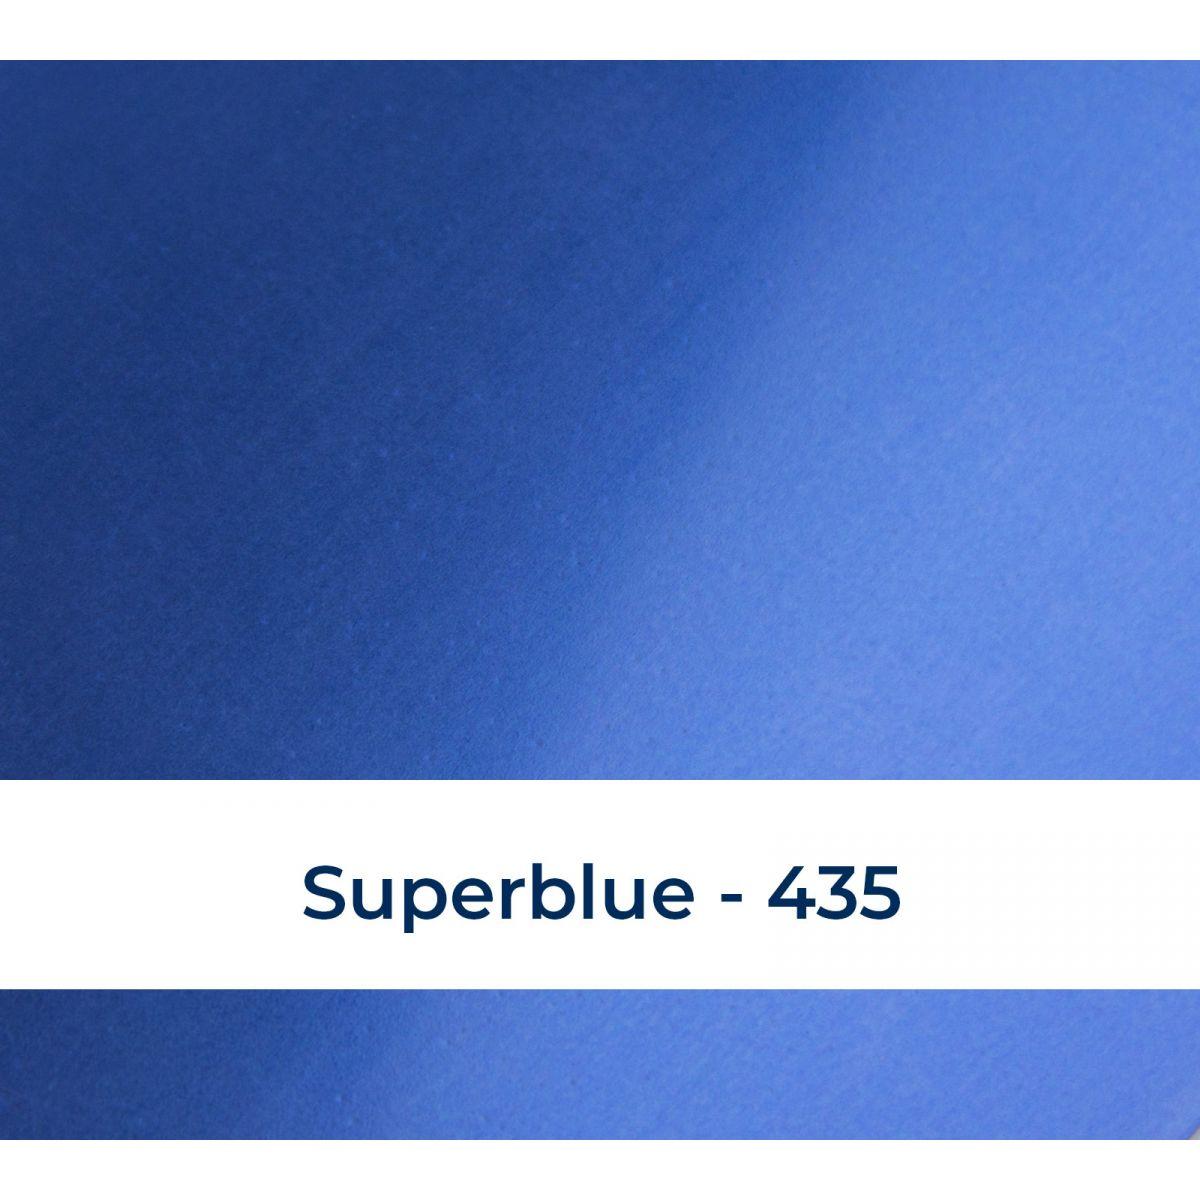 Metallic superblue 435